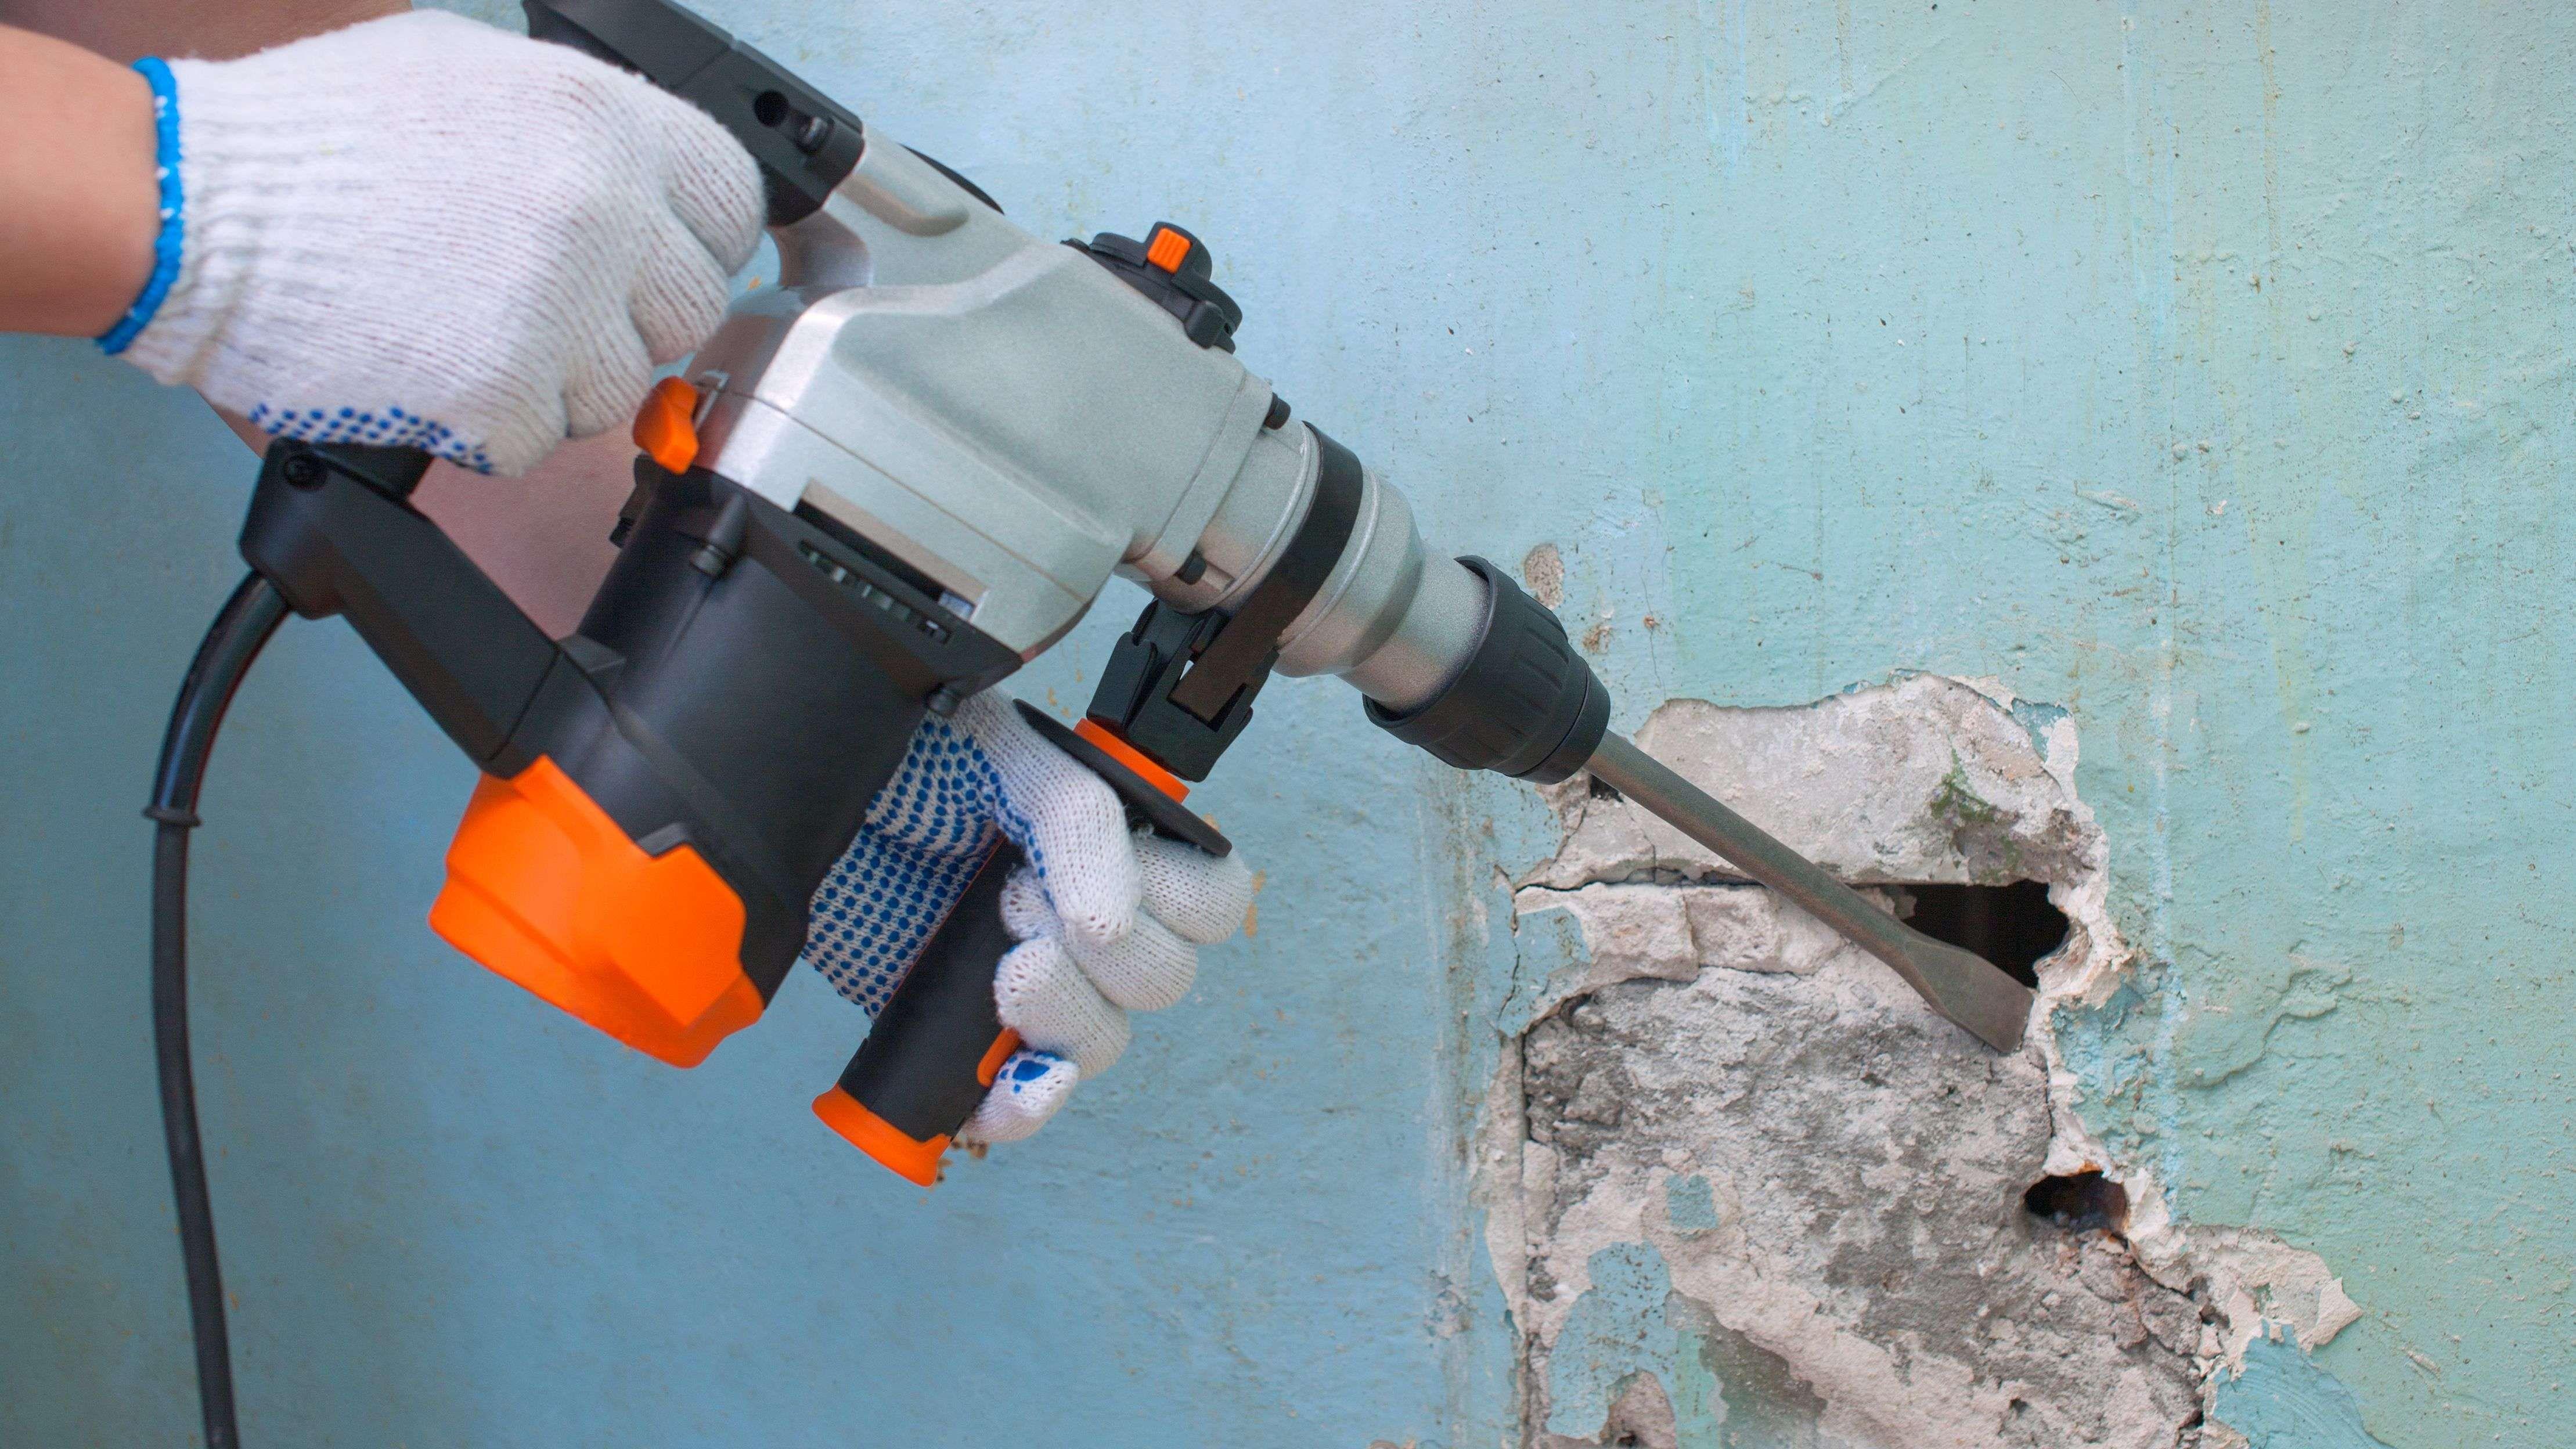 Cómo elegir un martillo perforador